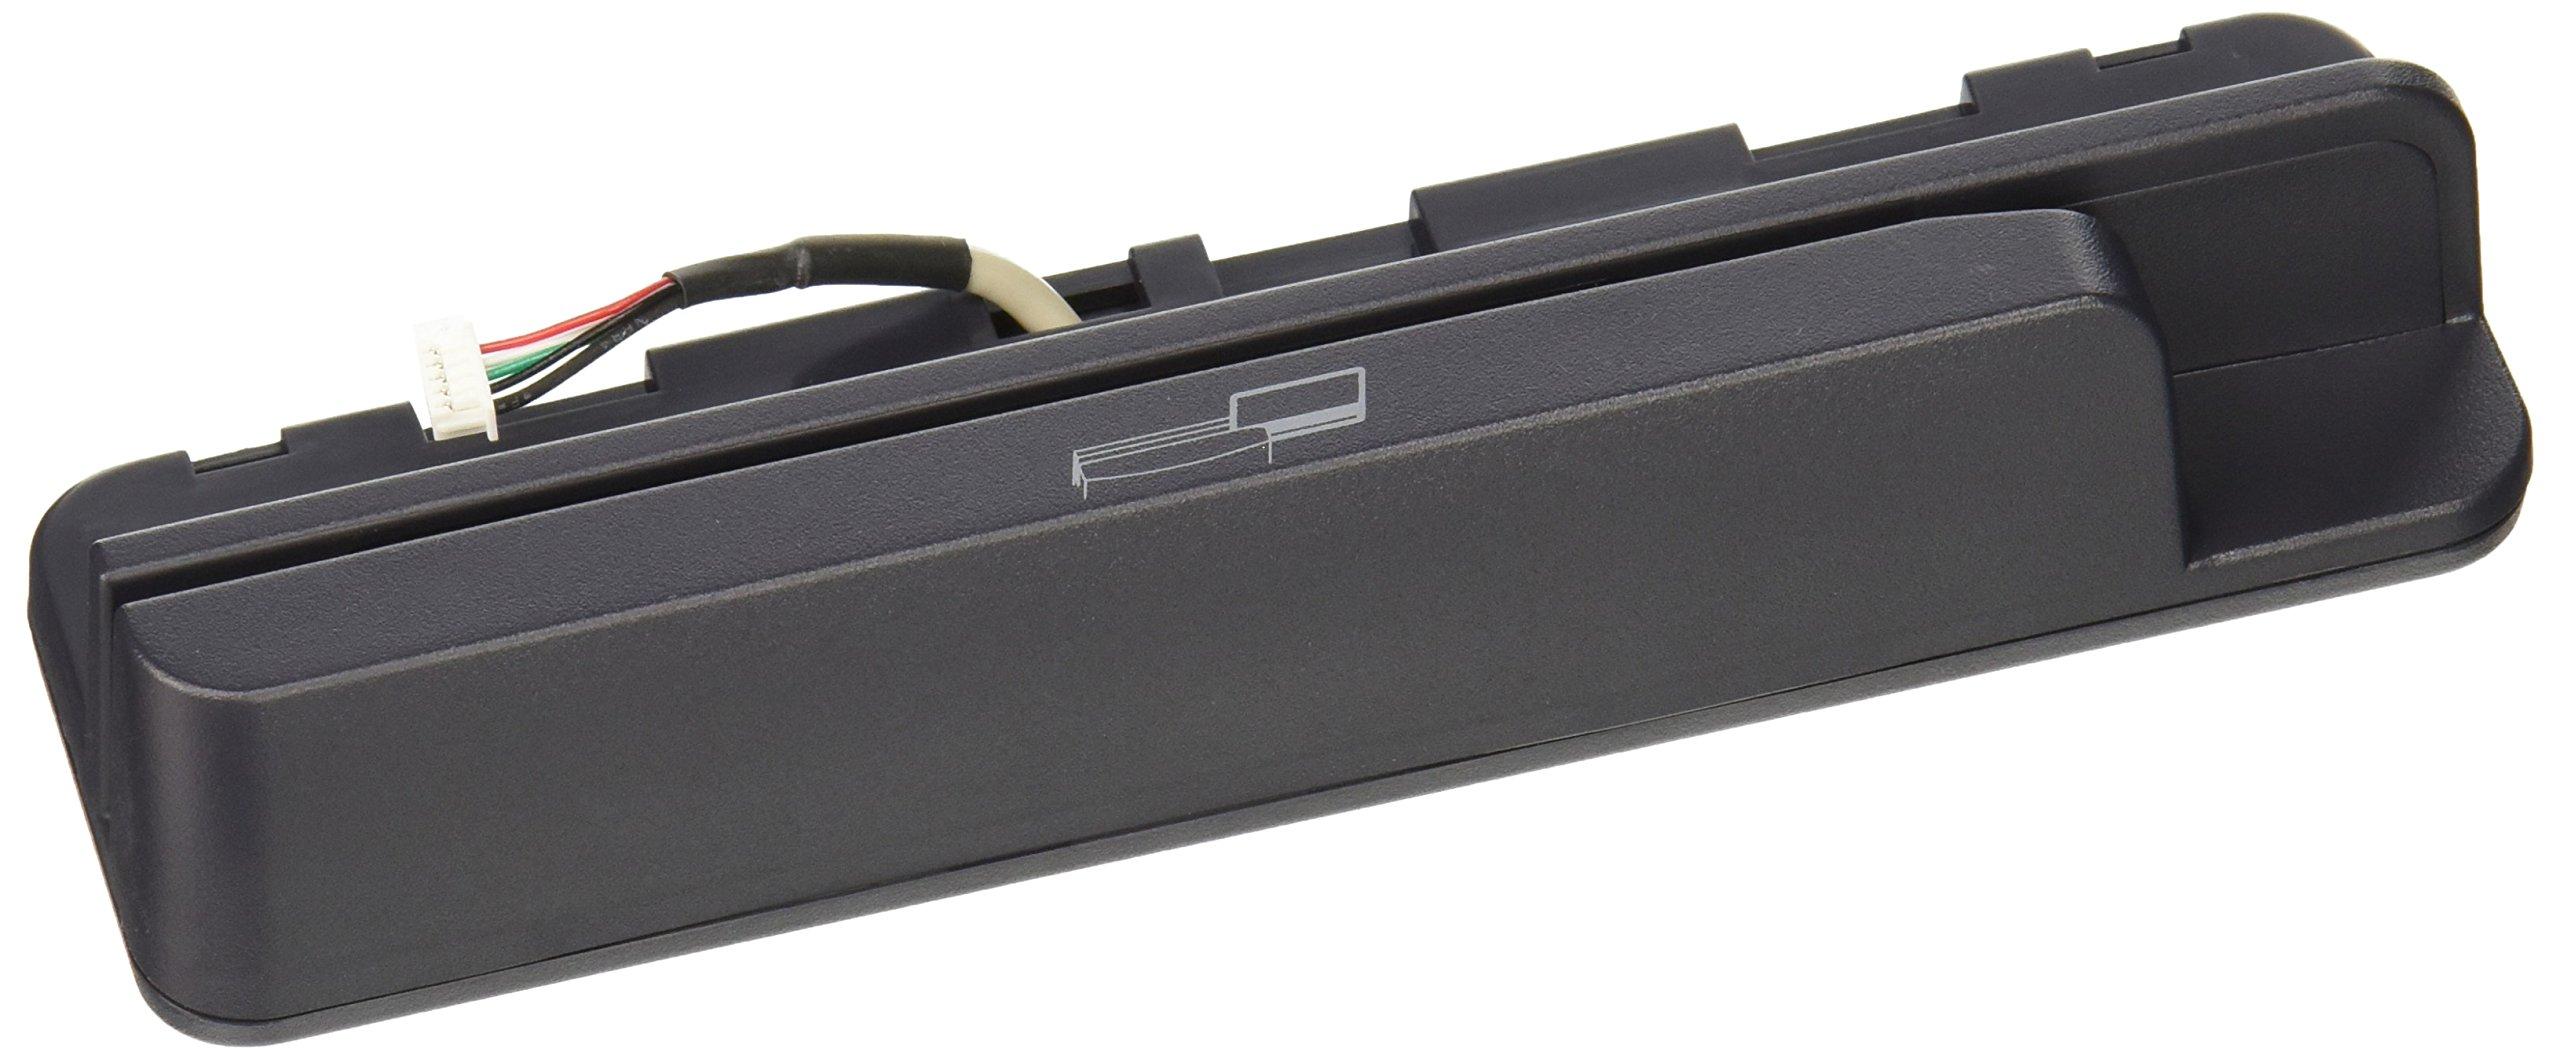 Elo 15D1 Field Installable USB Magnetic Stripe Reader for D-Series (V21637)